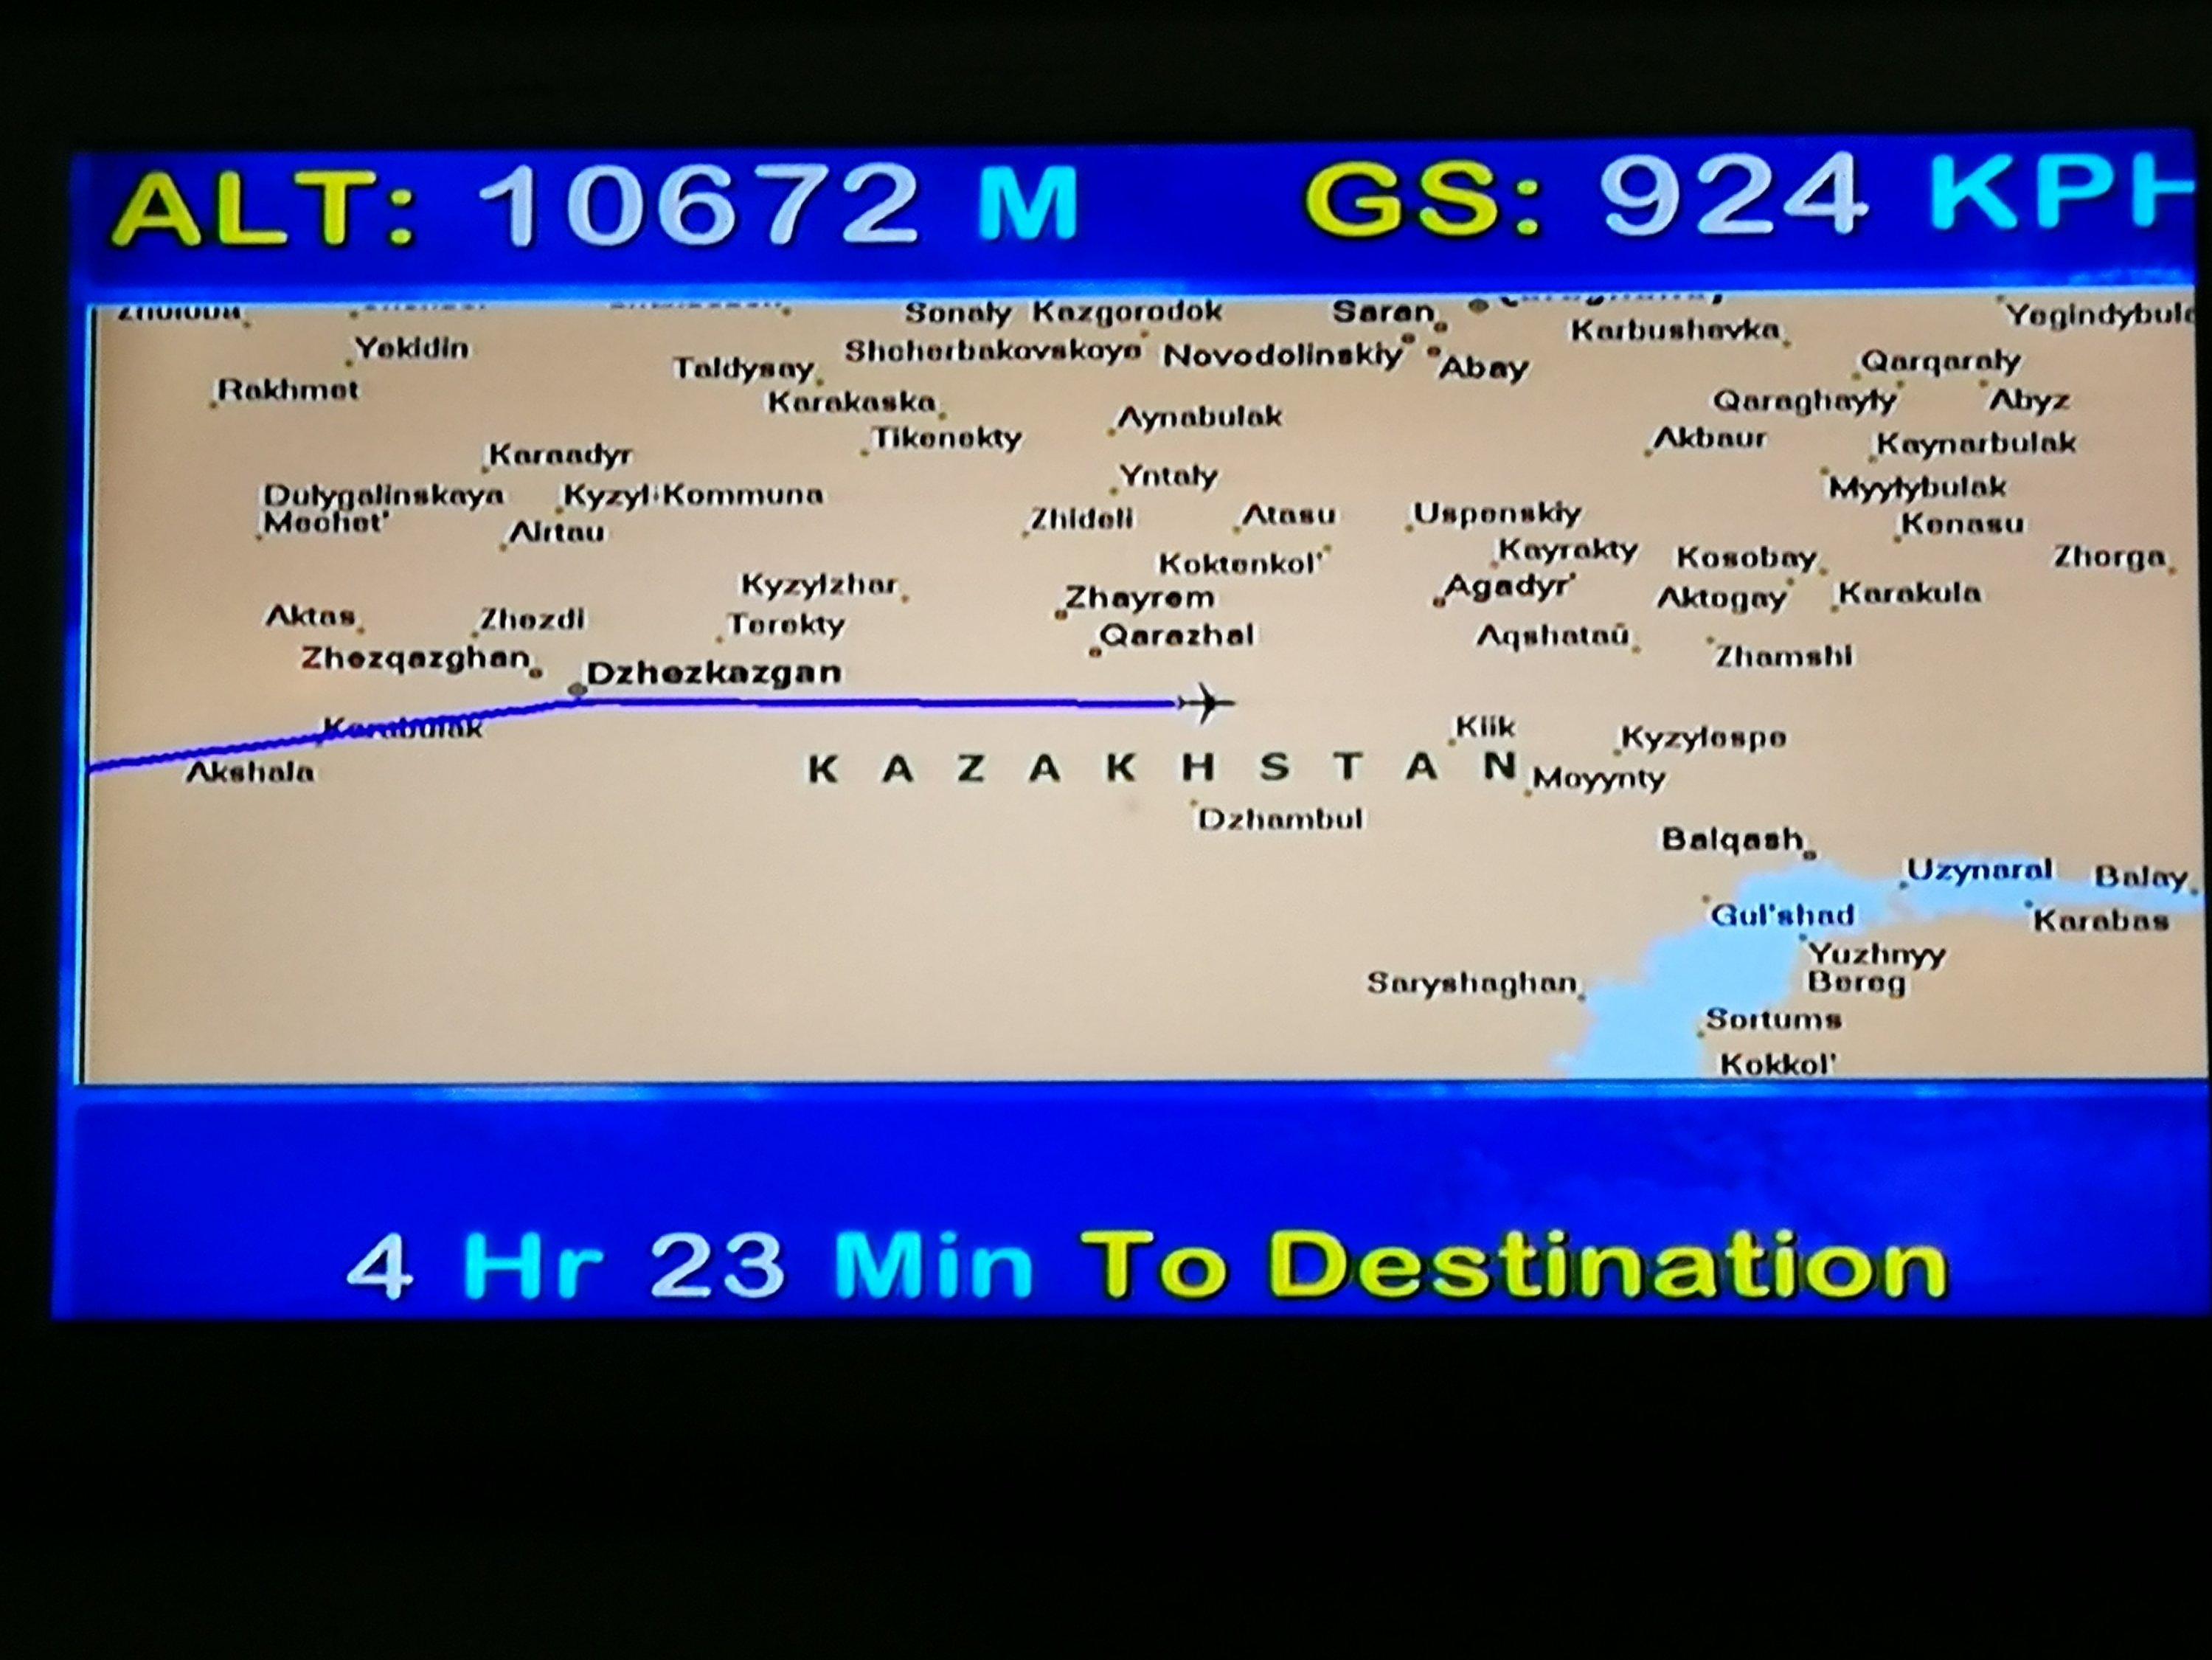 Escort in Balqash